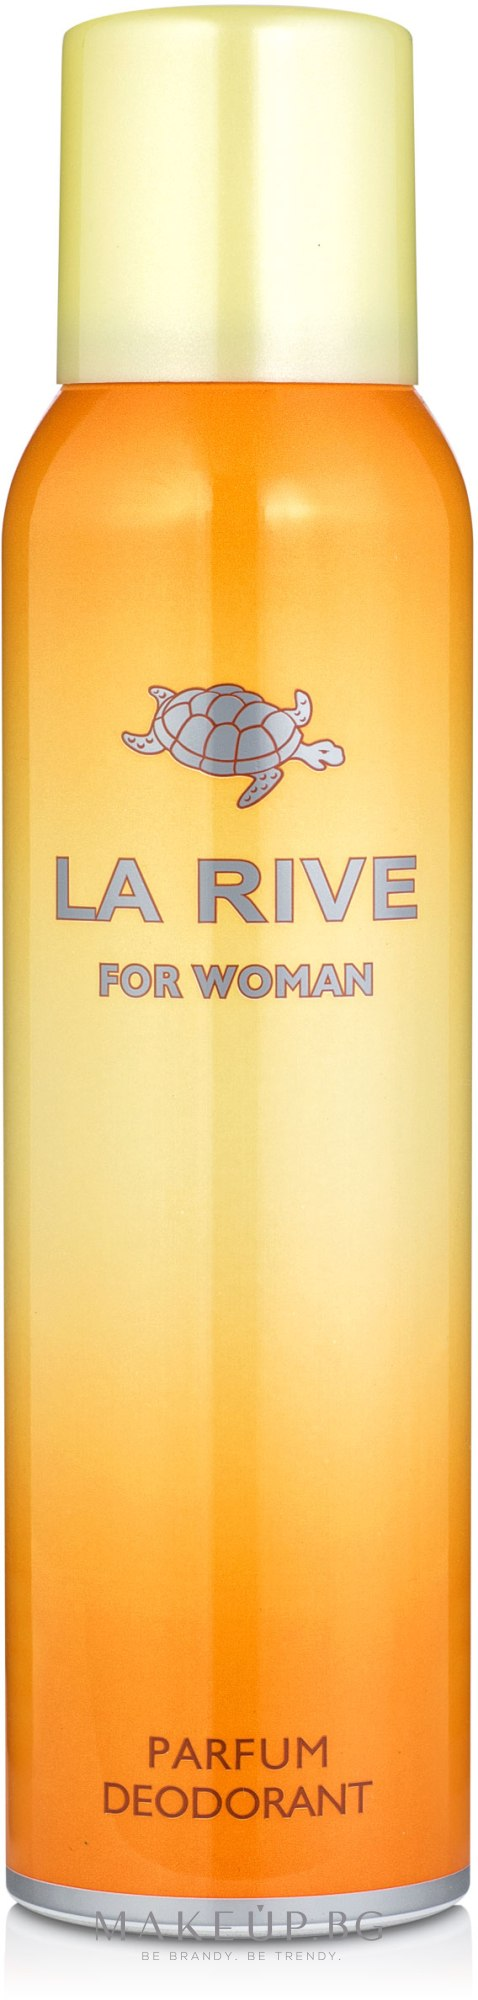 Дезодорант за жени - La Rive Woman  — снимка 150 ml